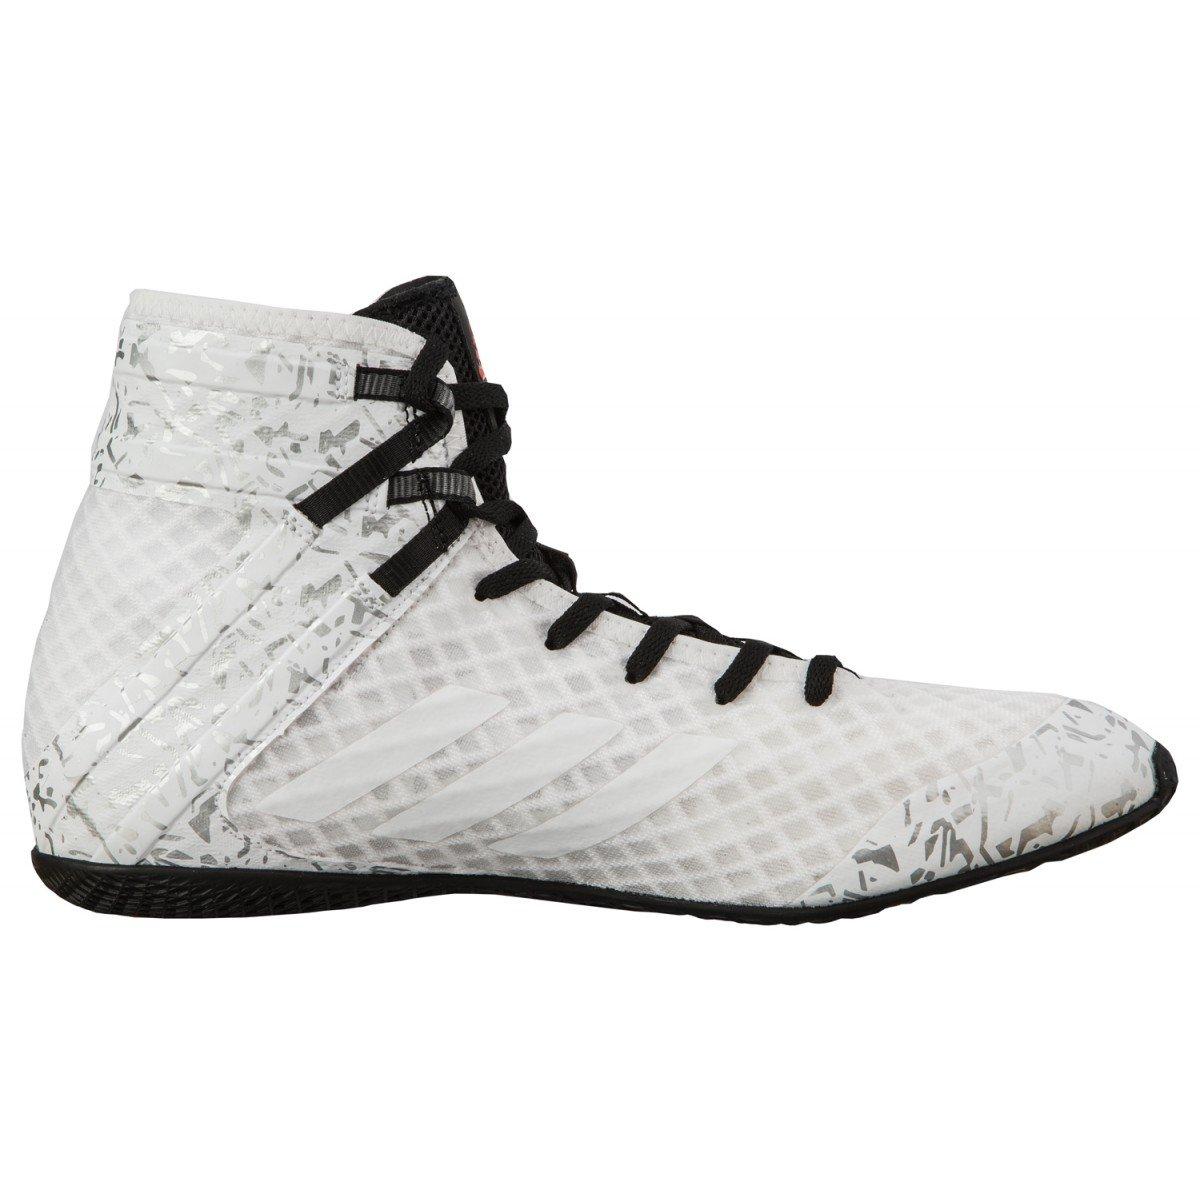 55e5c6771797 adidas Speedex 16.1 City Boxing Boot - White  Amazon.co.uk  Shoes   Bags